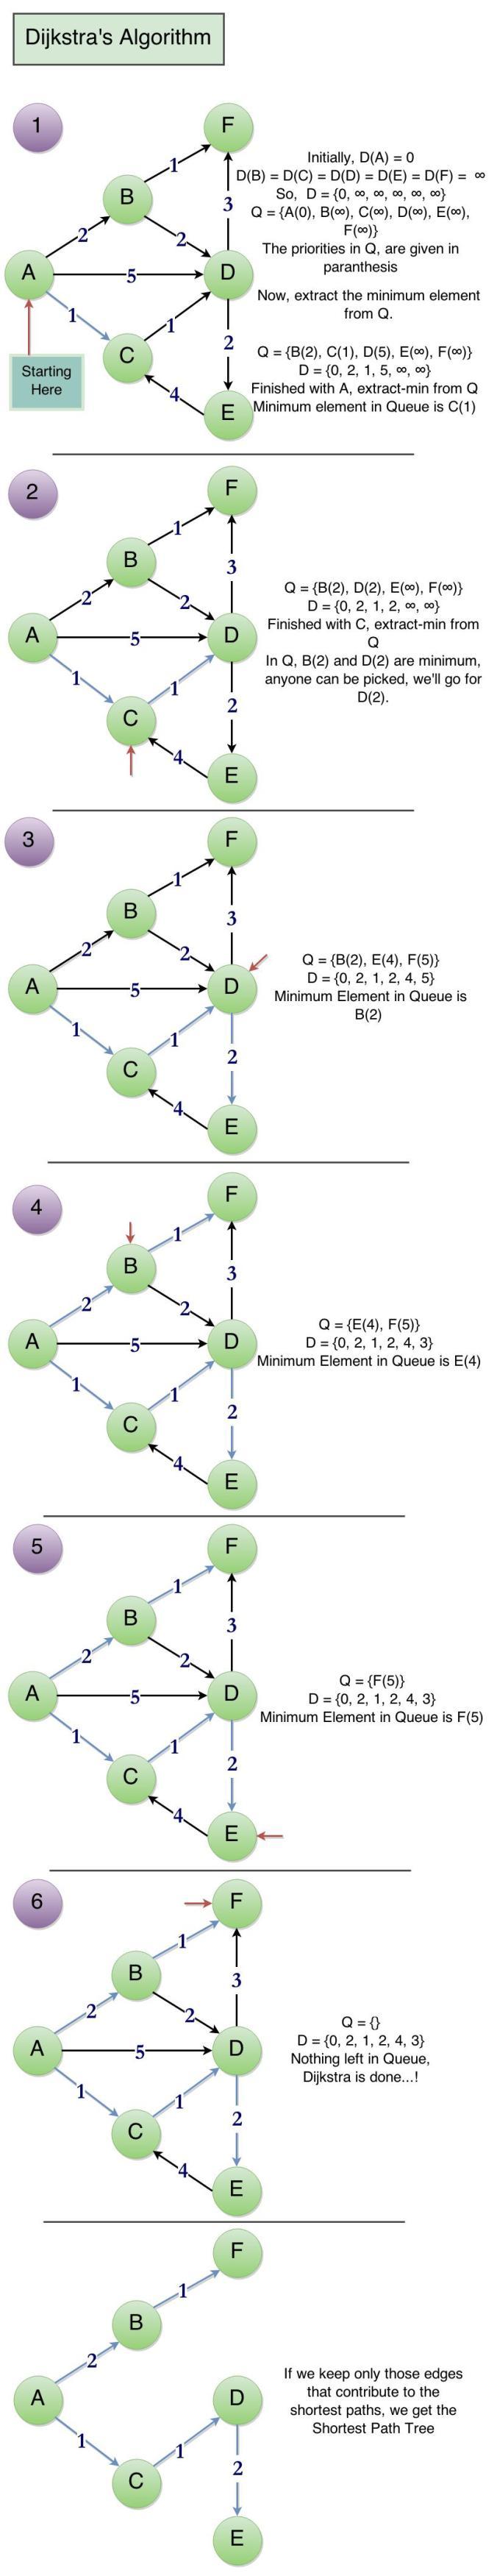 Dijkstra's Algorithm Step-by-Step